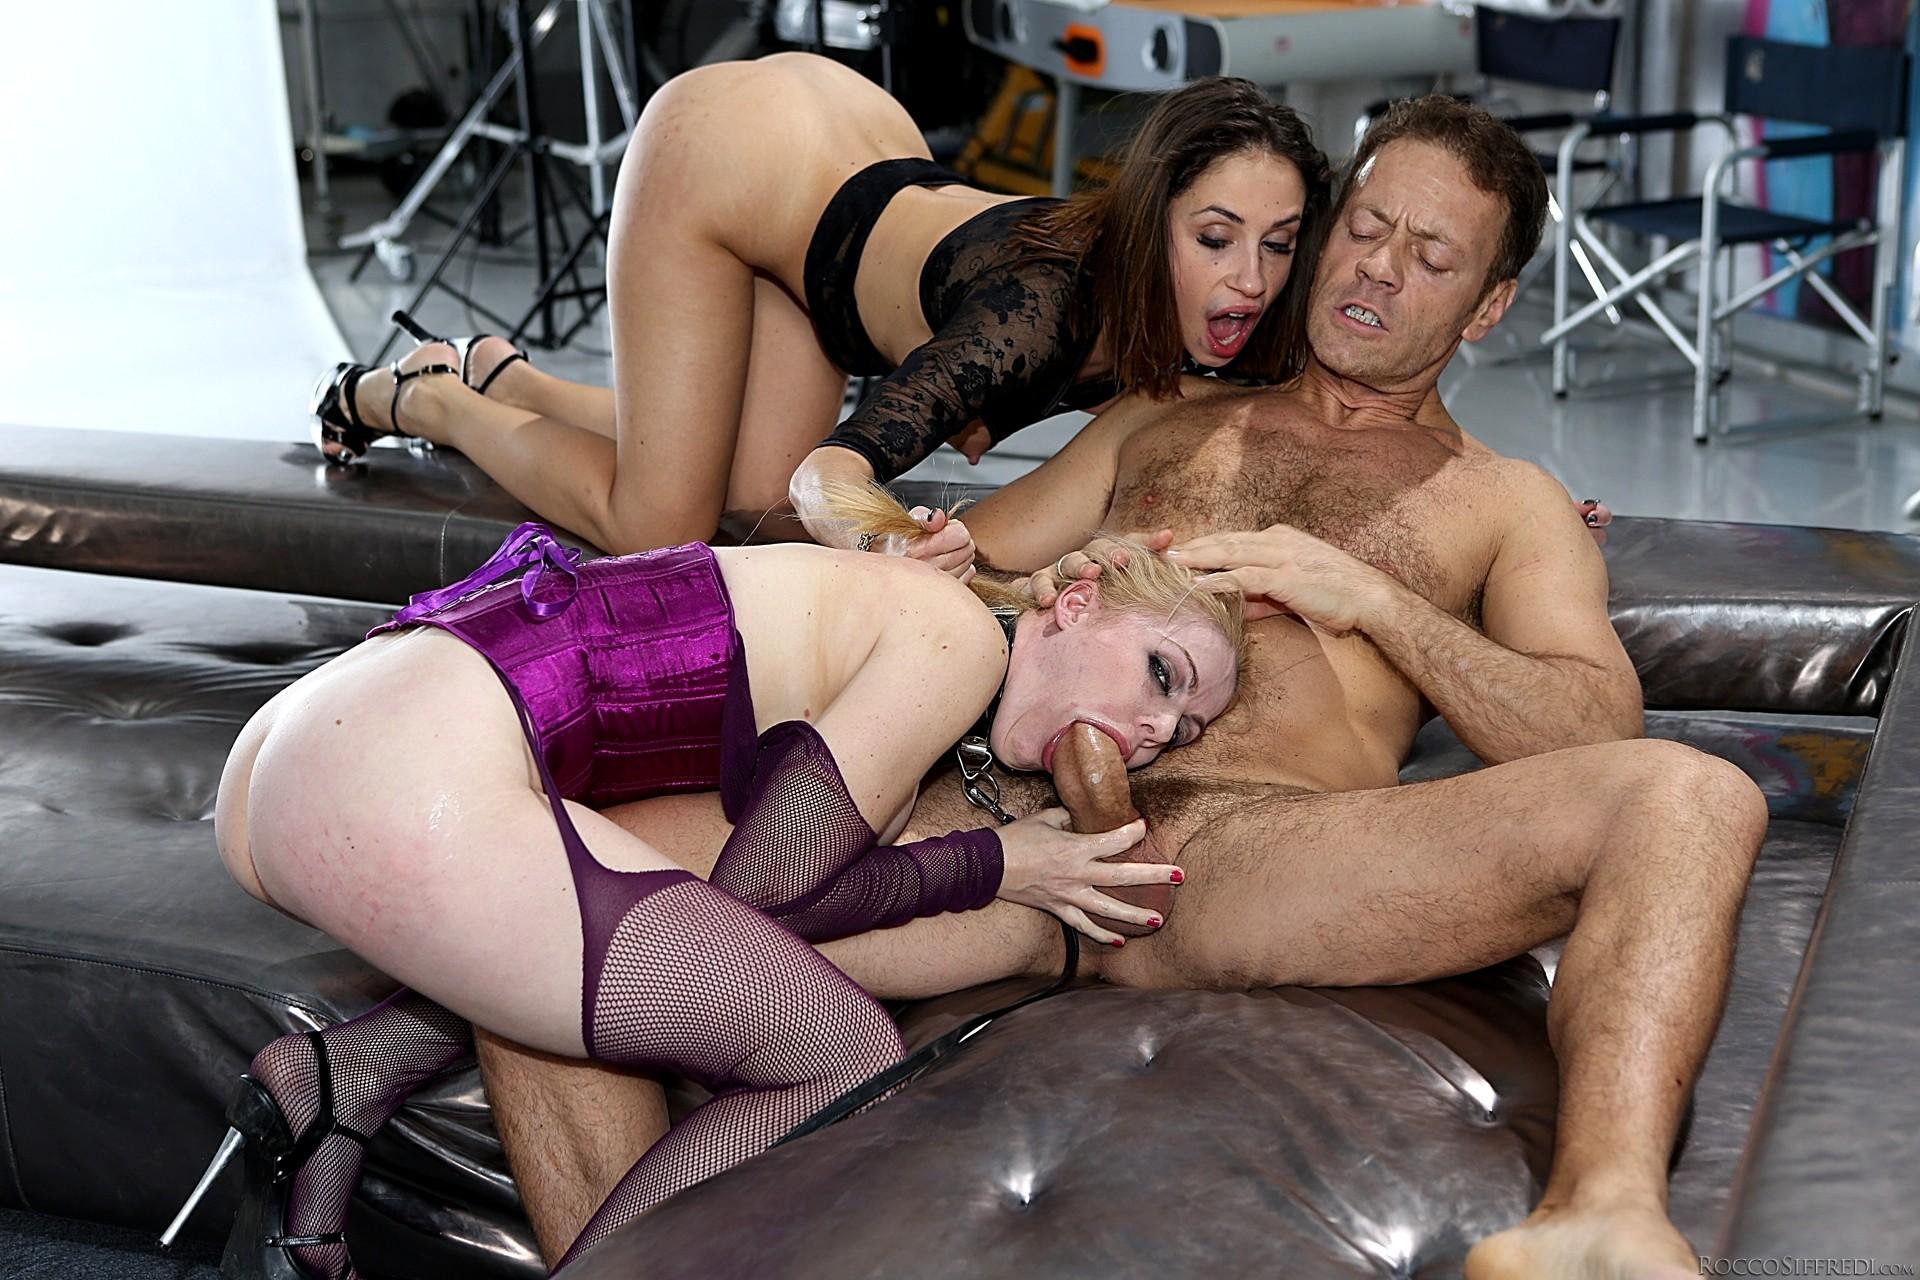 Fame digital kelly stafford kim xxx megan inky banned anal vintageeroticaforum sex hd pics